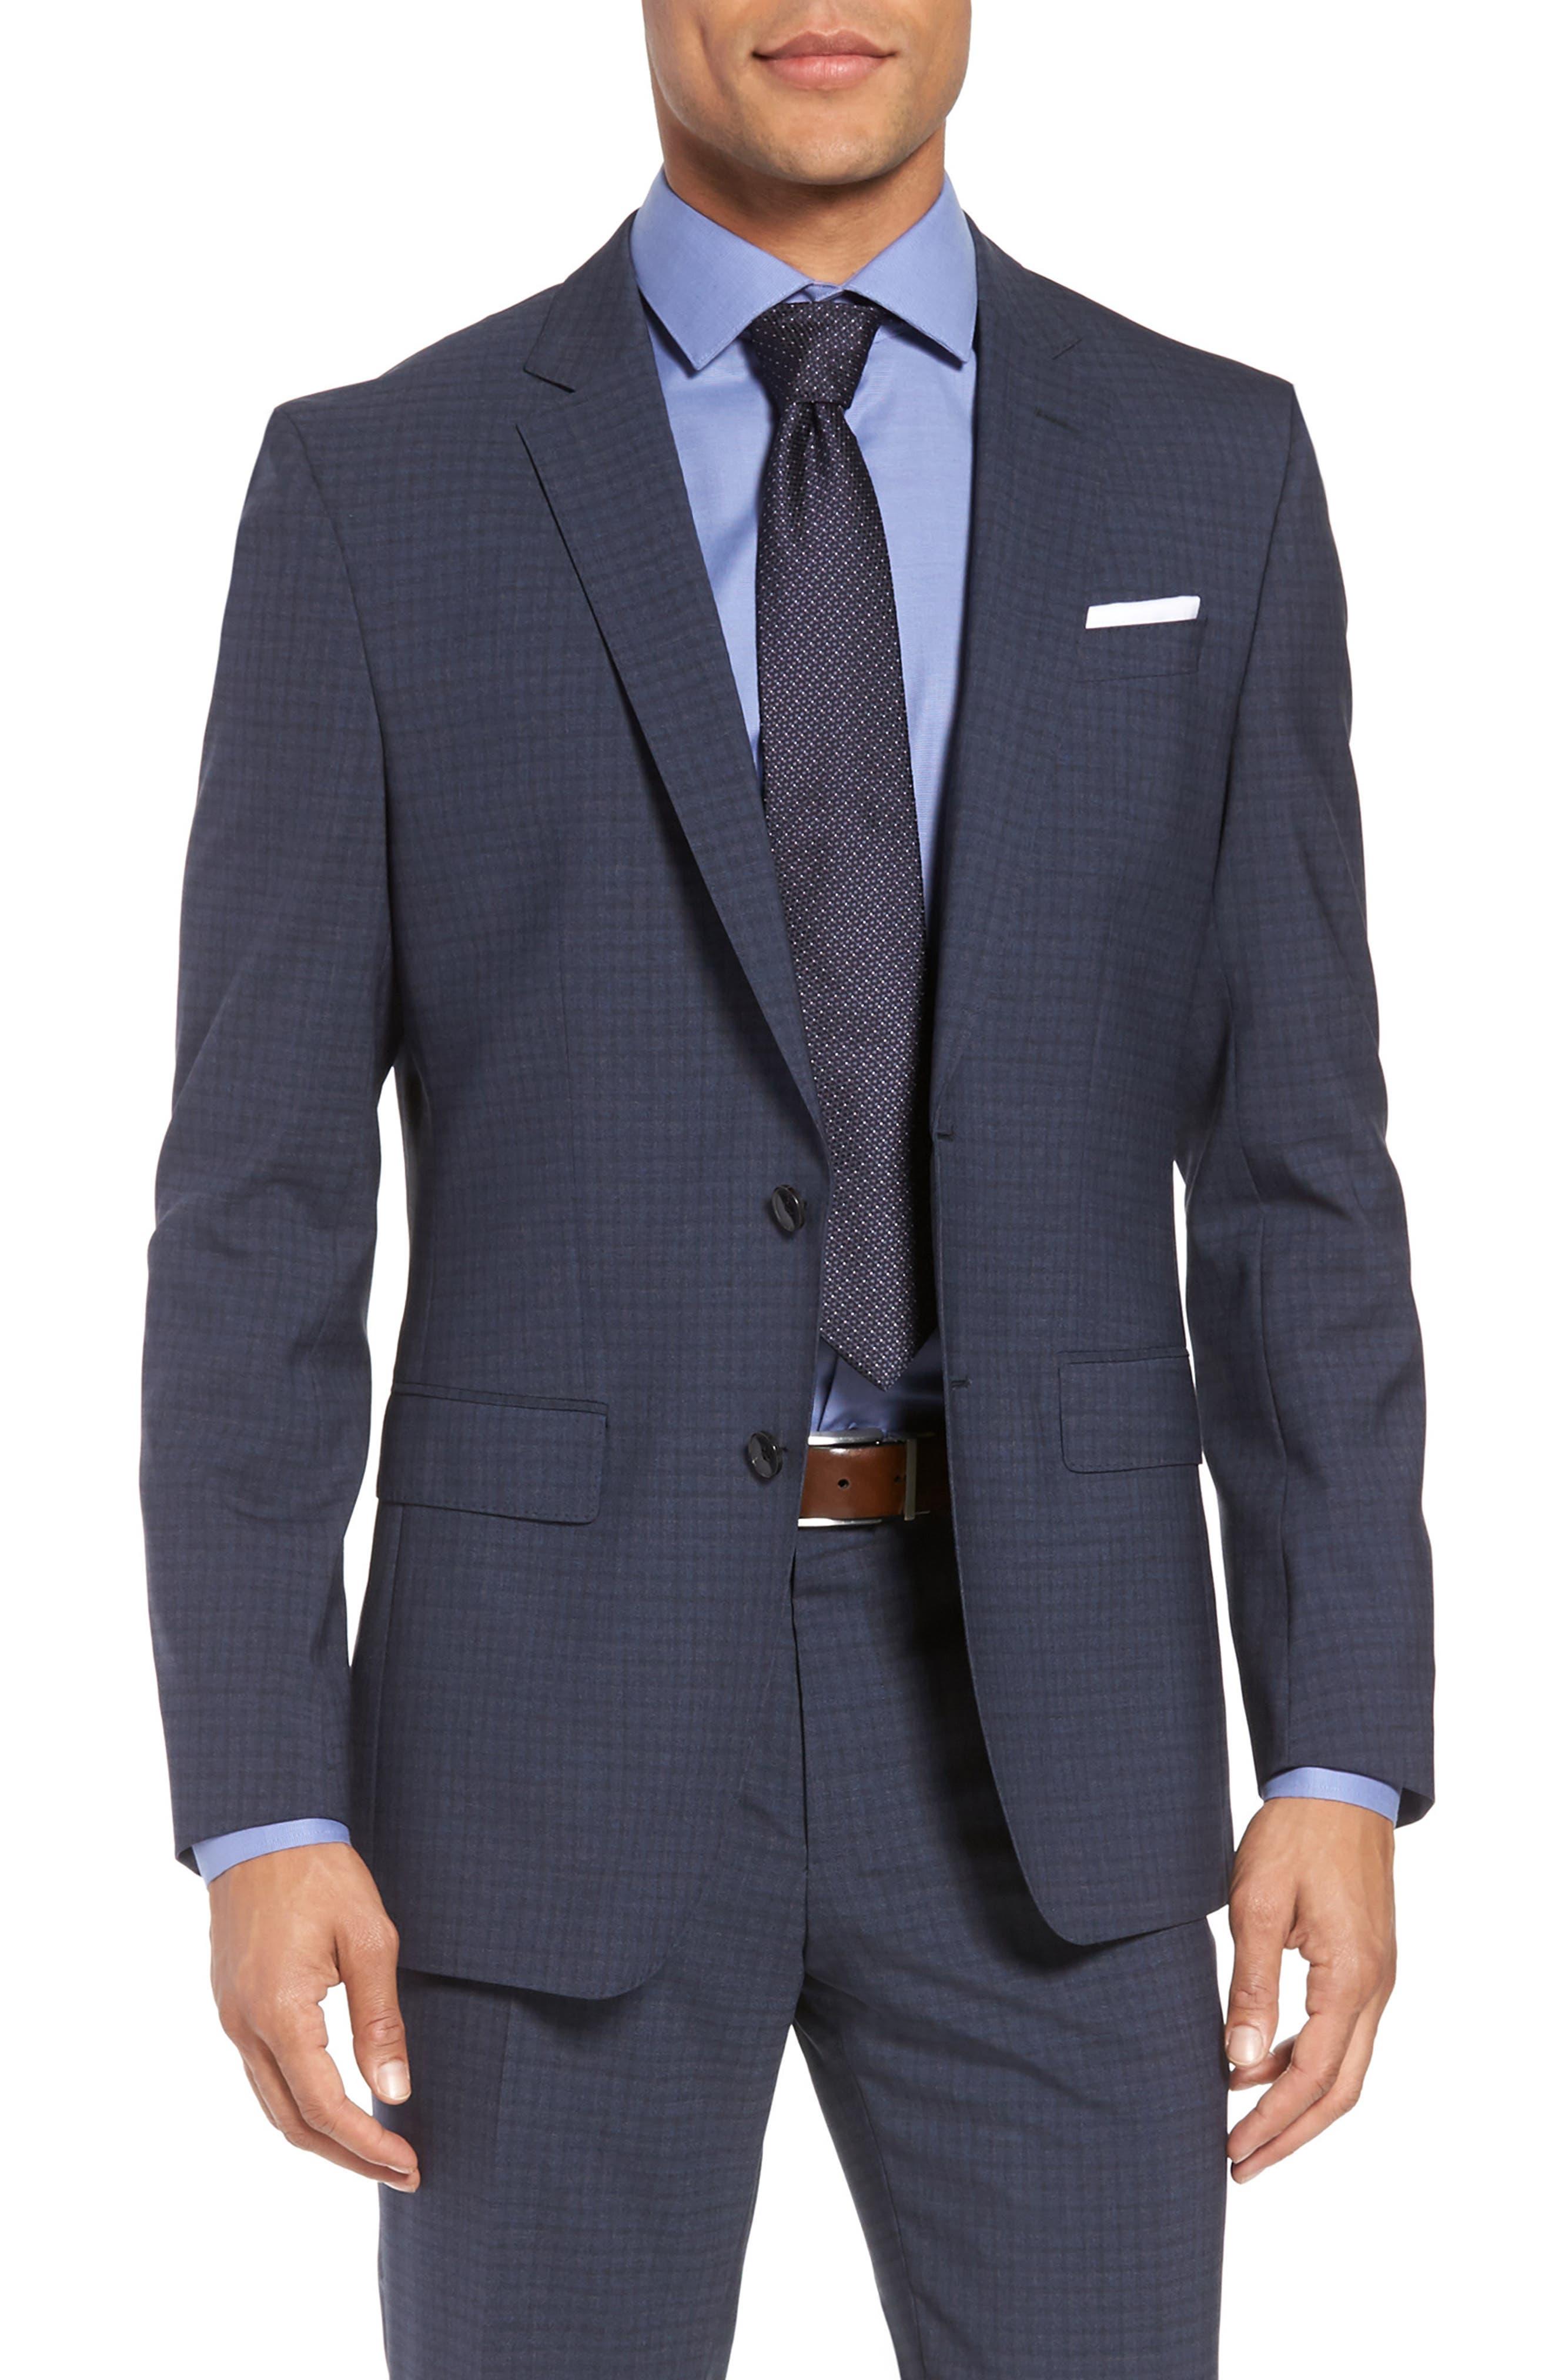 Huge/Genius Trim Fit Check Wool Suit,                             Alternate thumbnail 5, color,                             Blue/ Brown/ Charcoal